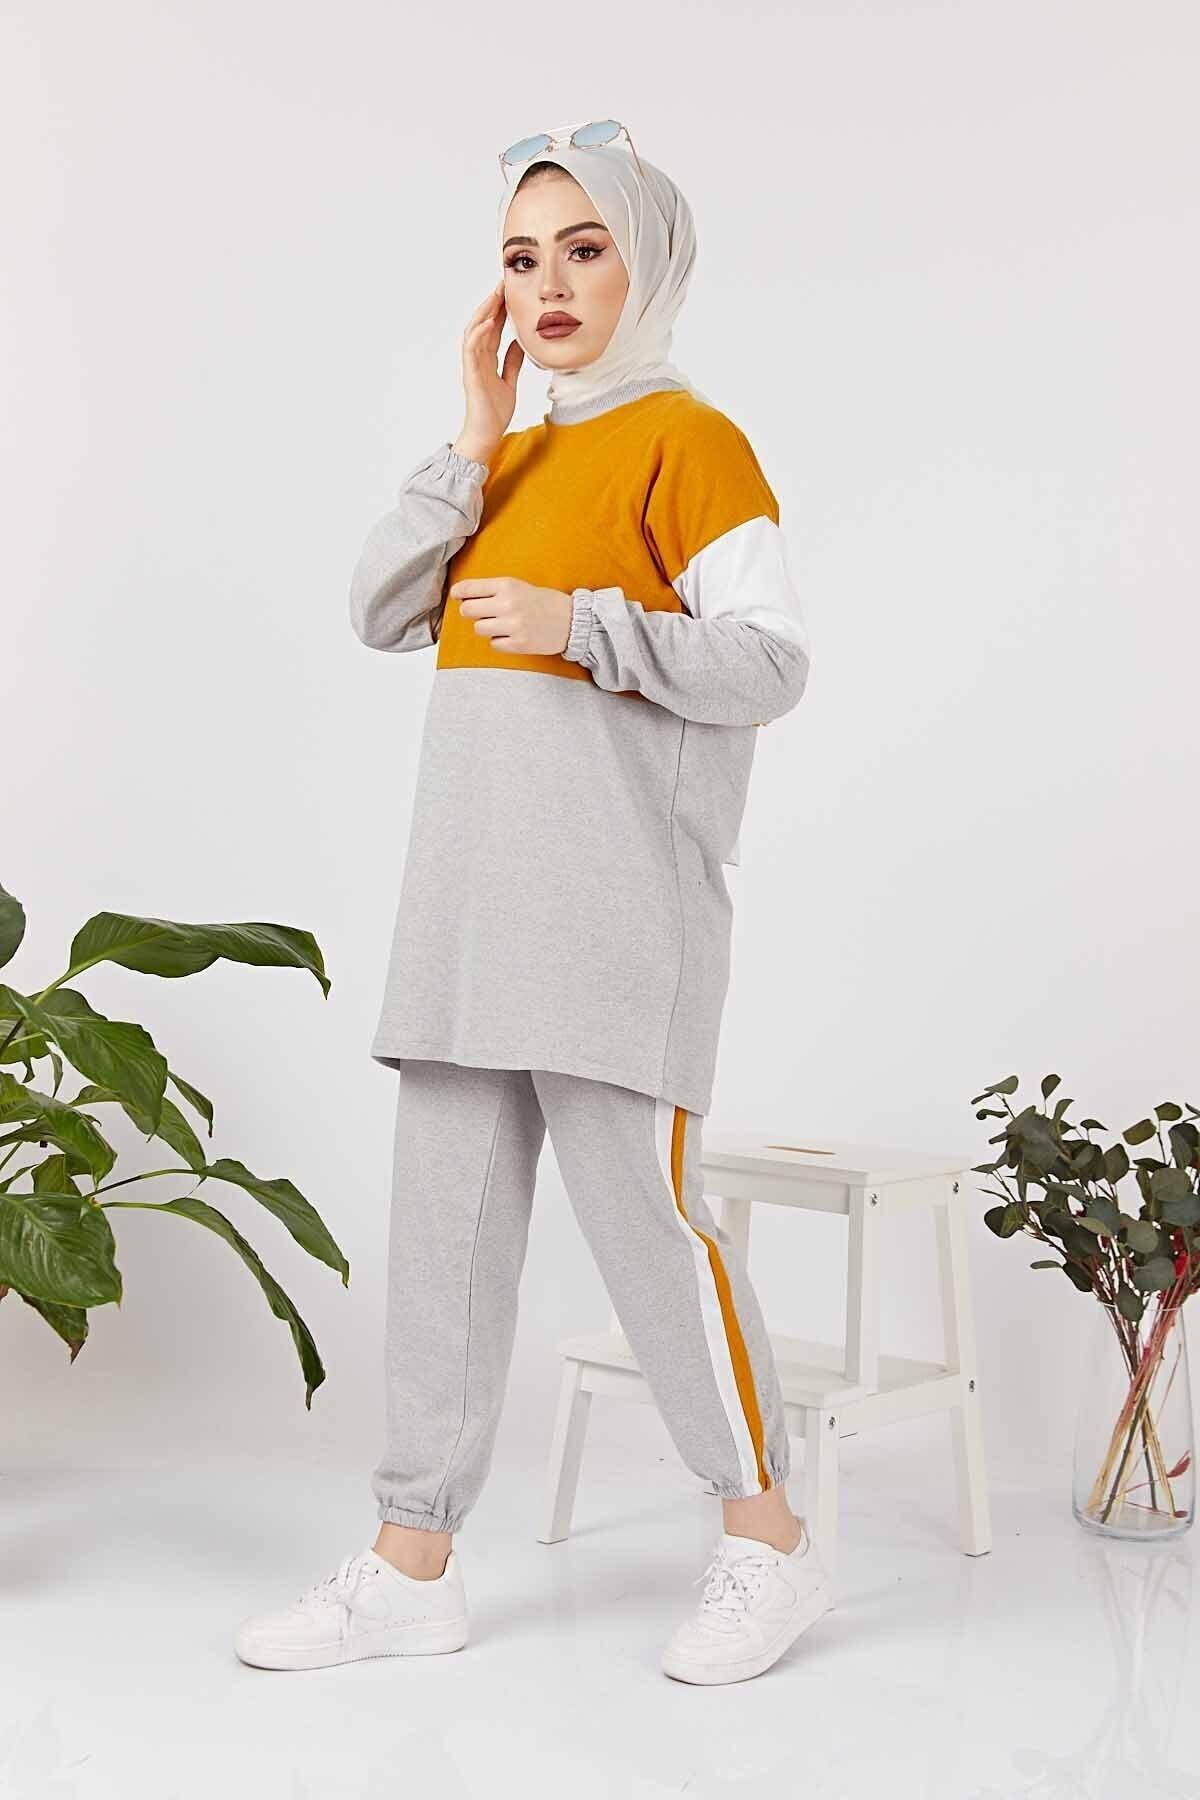 FESTMODA Woman Sports Outfit Islamic Suit Muslim Dress